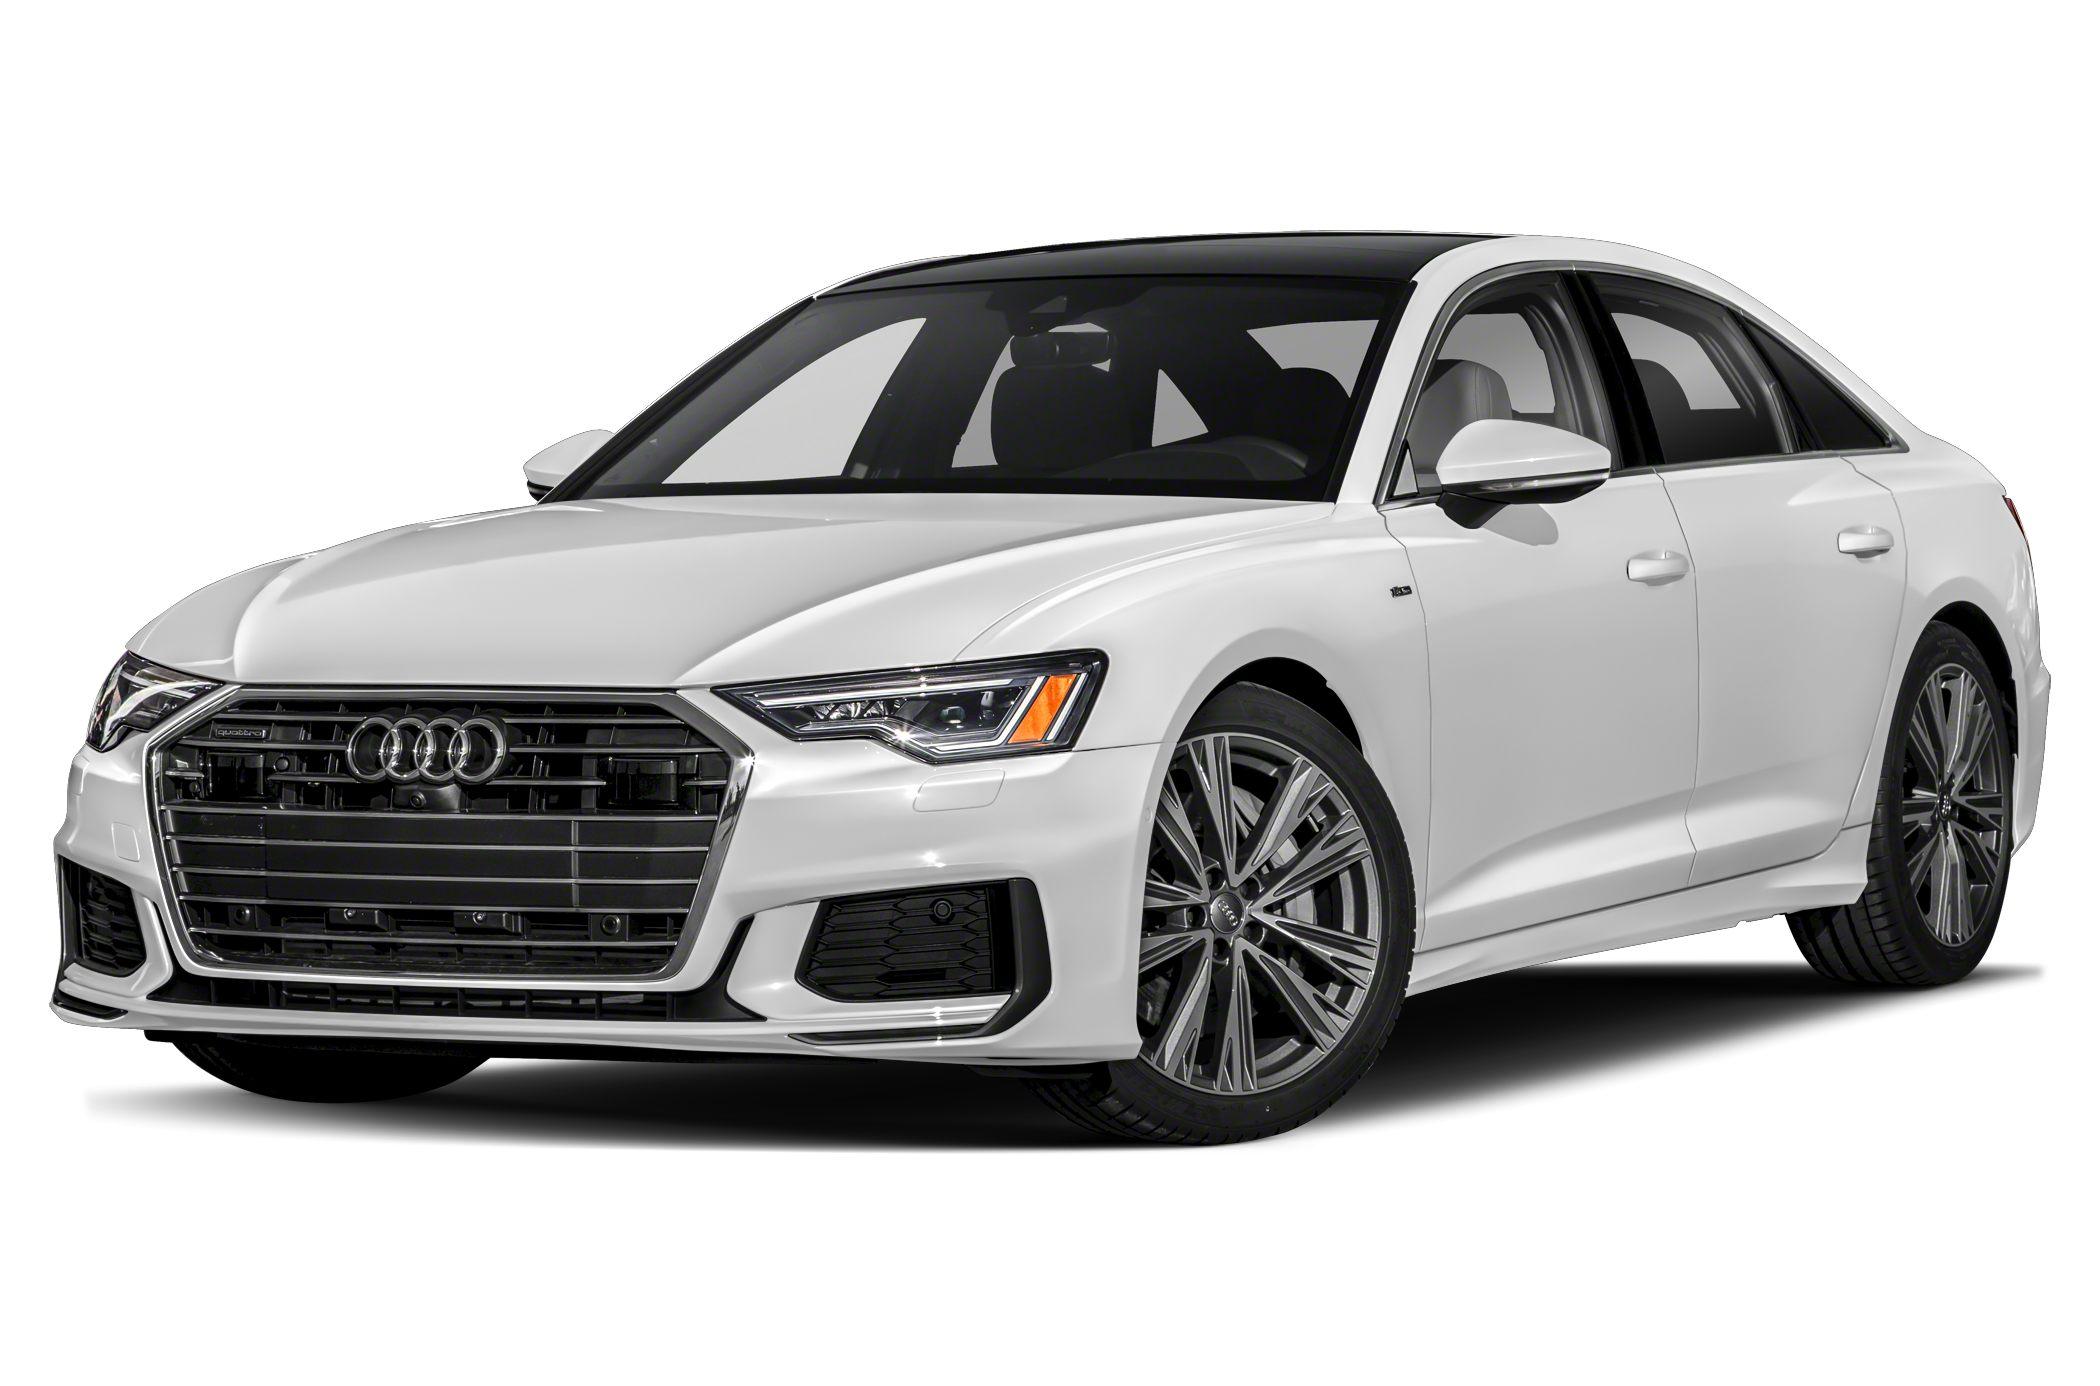 2020 Audi A6 Reviews, Specs, Photos